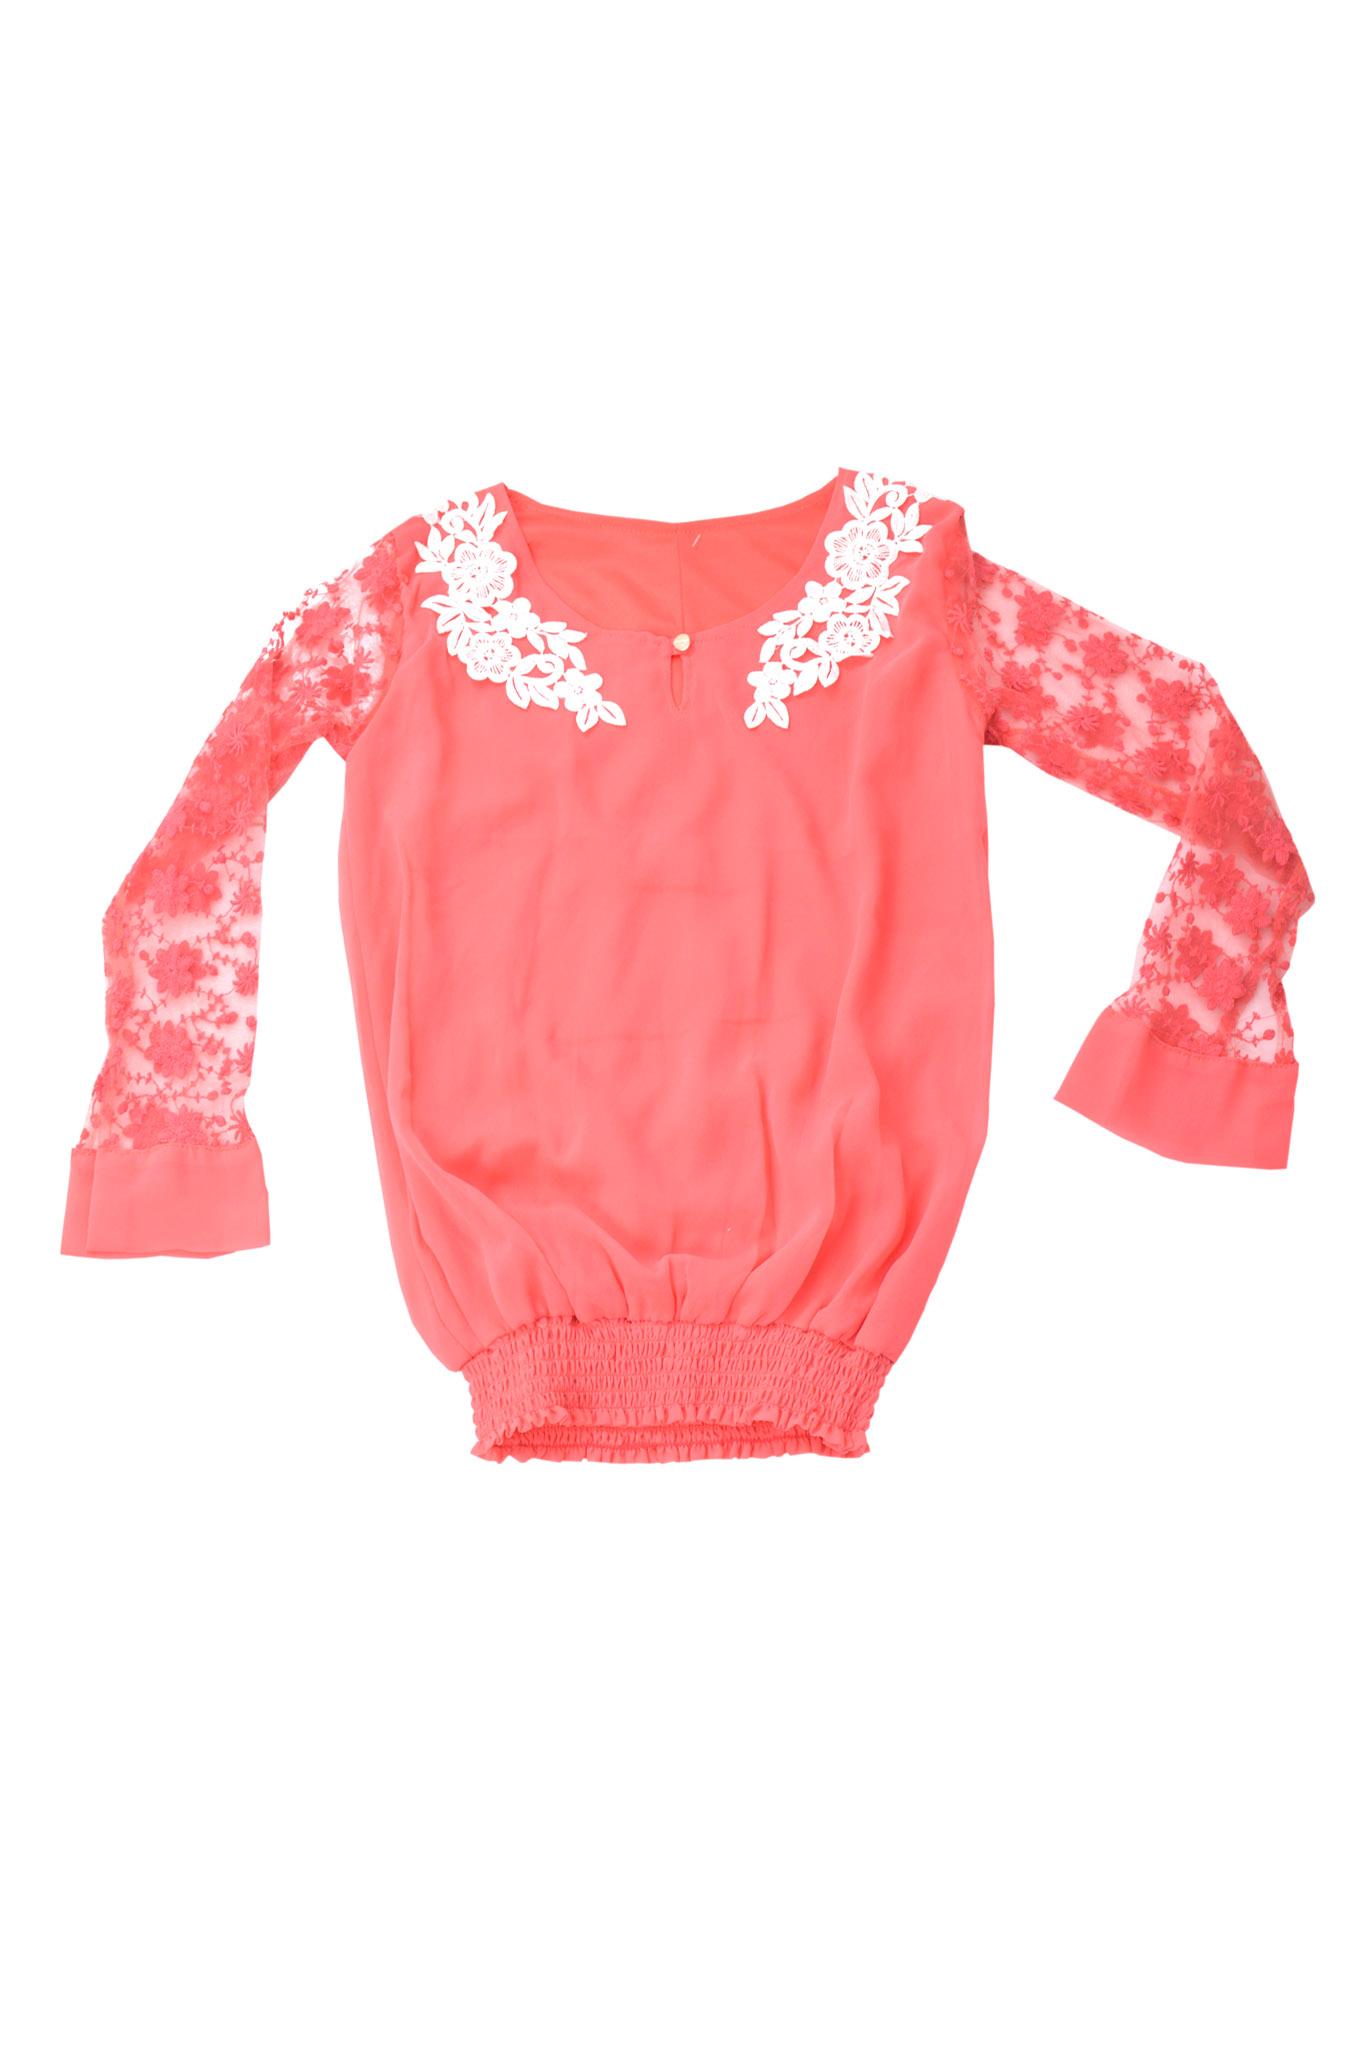 Designer Pink Top